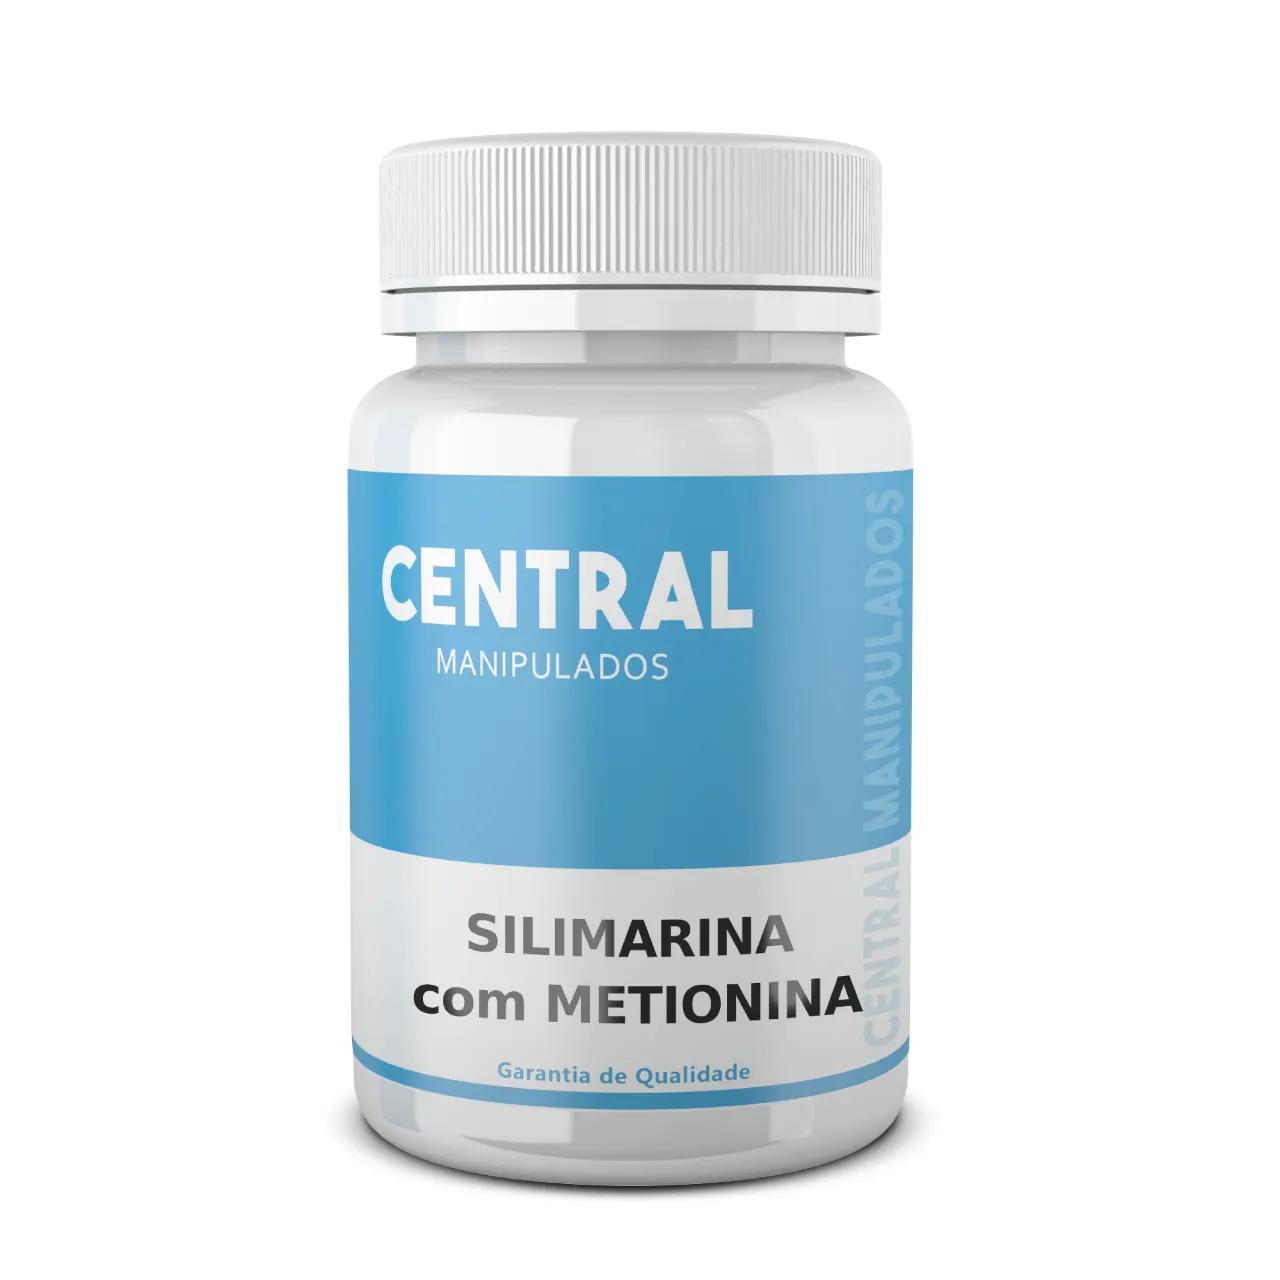 Silimarina 200mg + Metionina 120mg - 180 Cápsulas - Protetor do Fígado